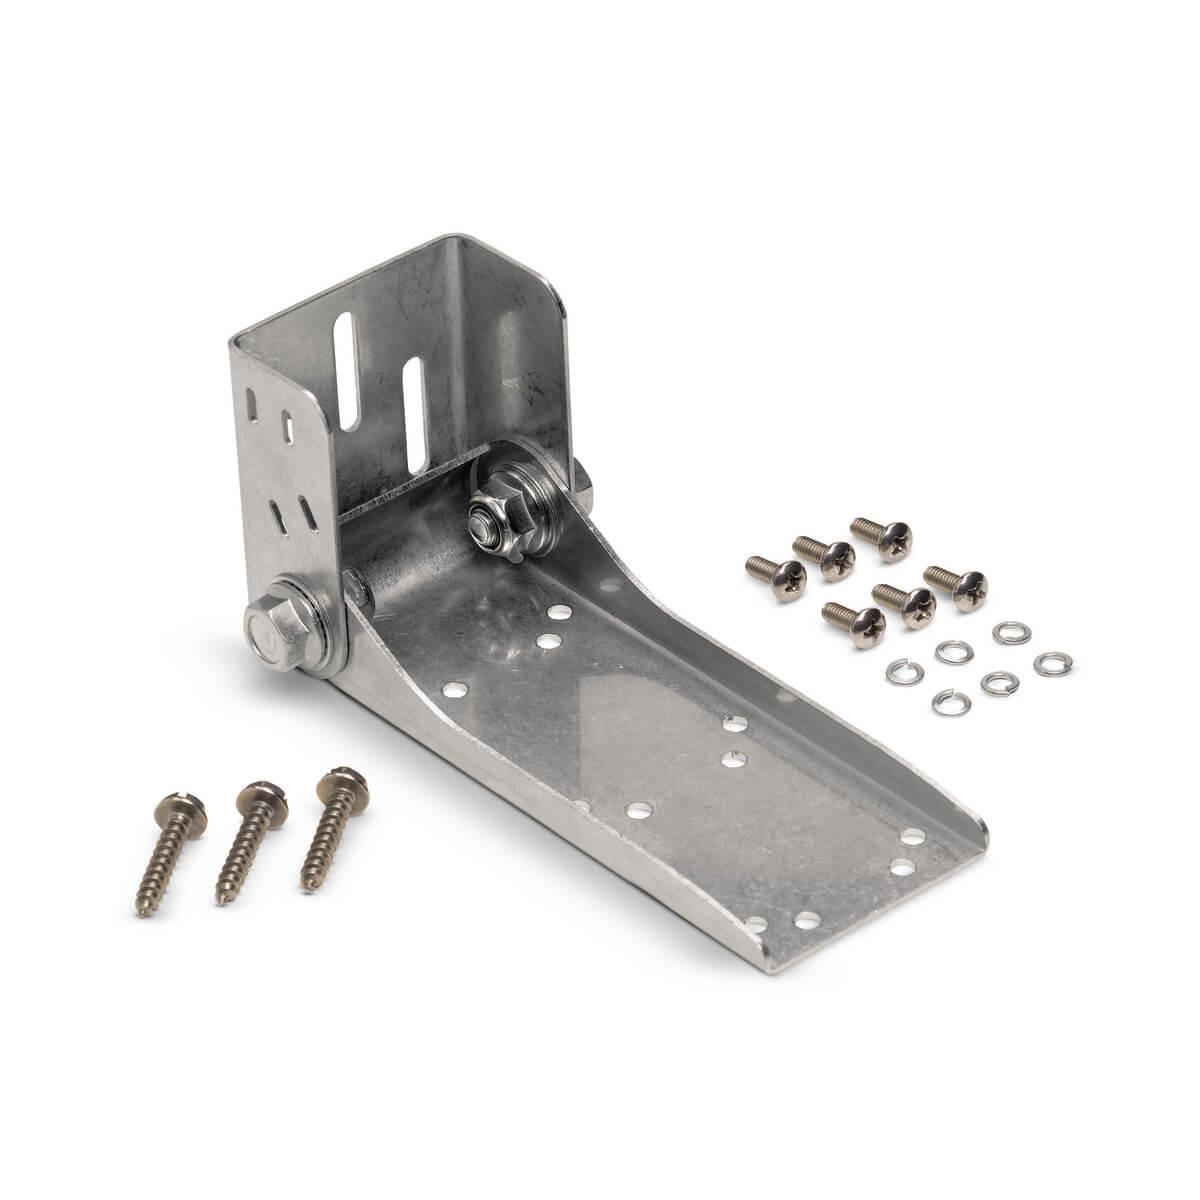 Humminbird MHX XM HW - MEGA / MEGA Imaging+  Metal Transom Mounting Bracket